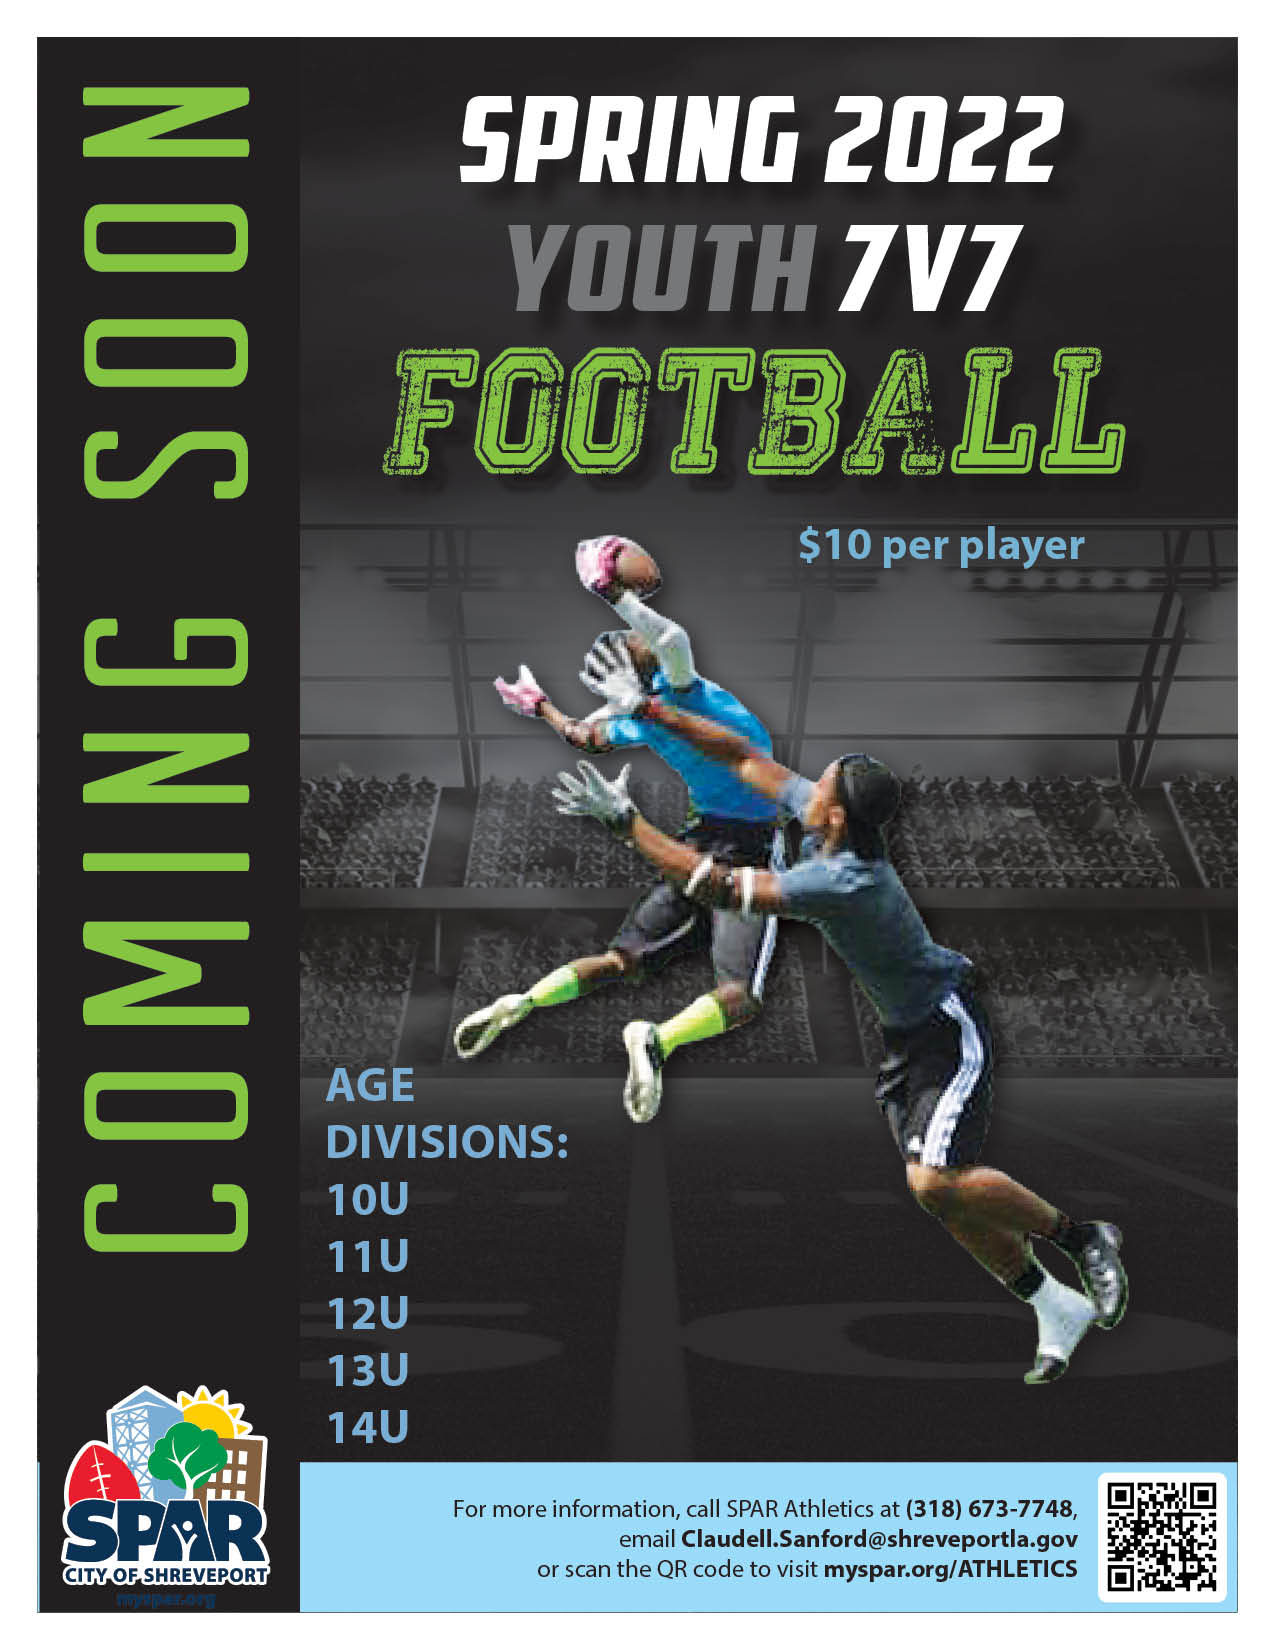 2021 0607 Youth Athletics Spring 22 7on7 Football